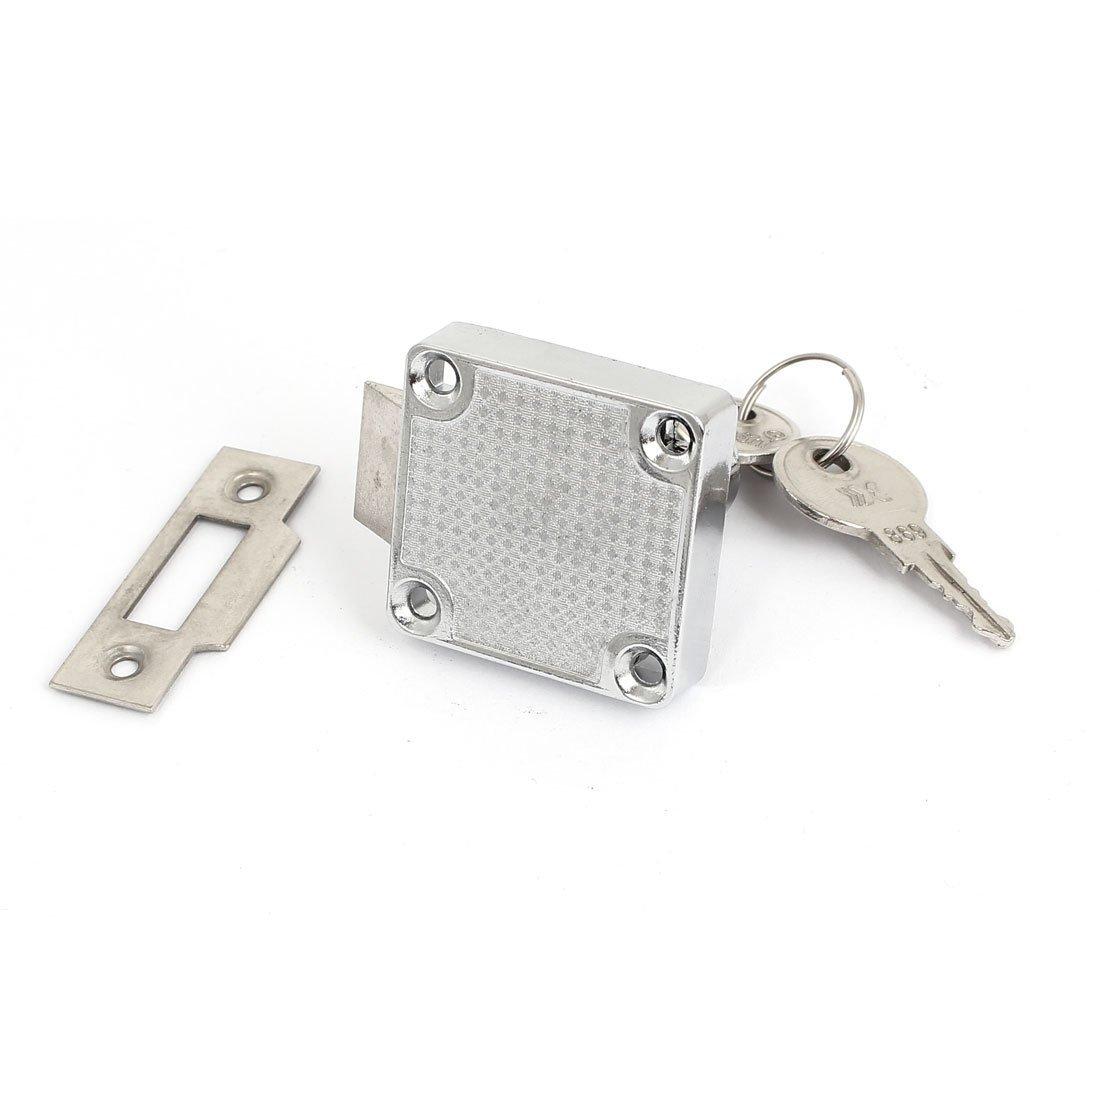 Amazon.com : eDealMax Gabinete cajonera 40mmx39mmx31mm Bloqueo del Metal de Plata del tono w Teclas : Baby